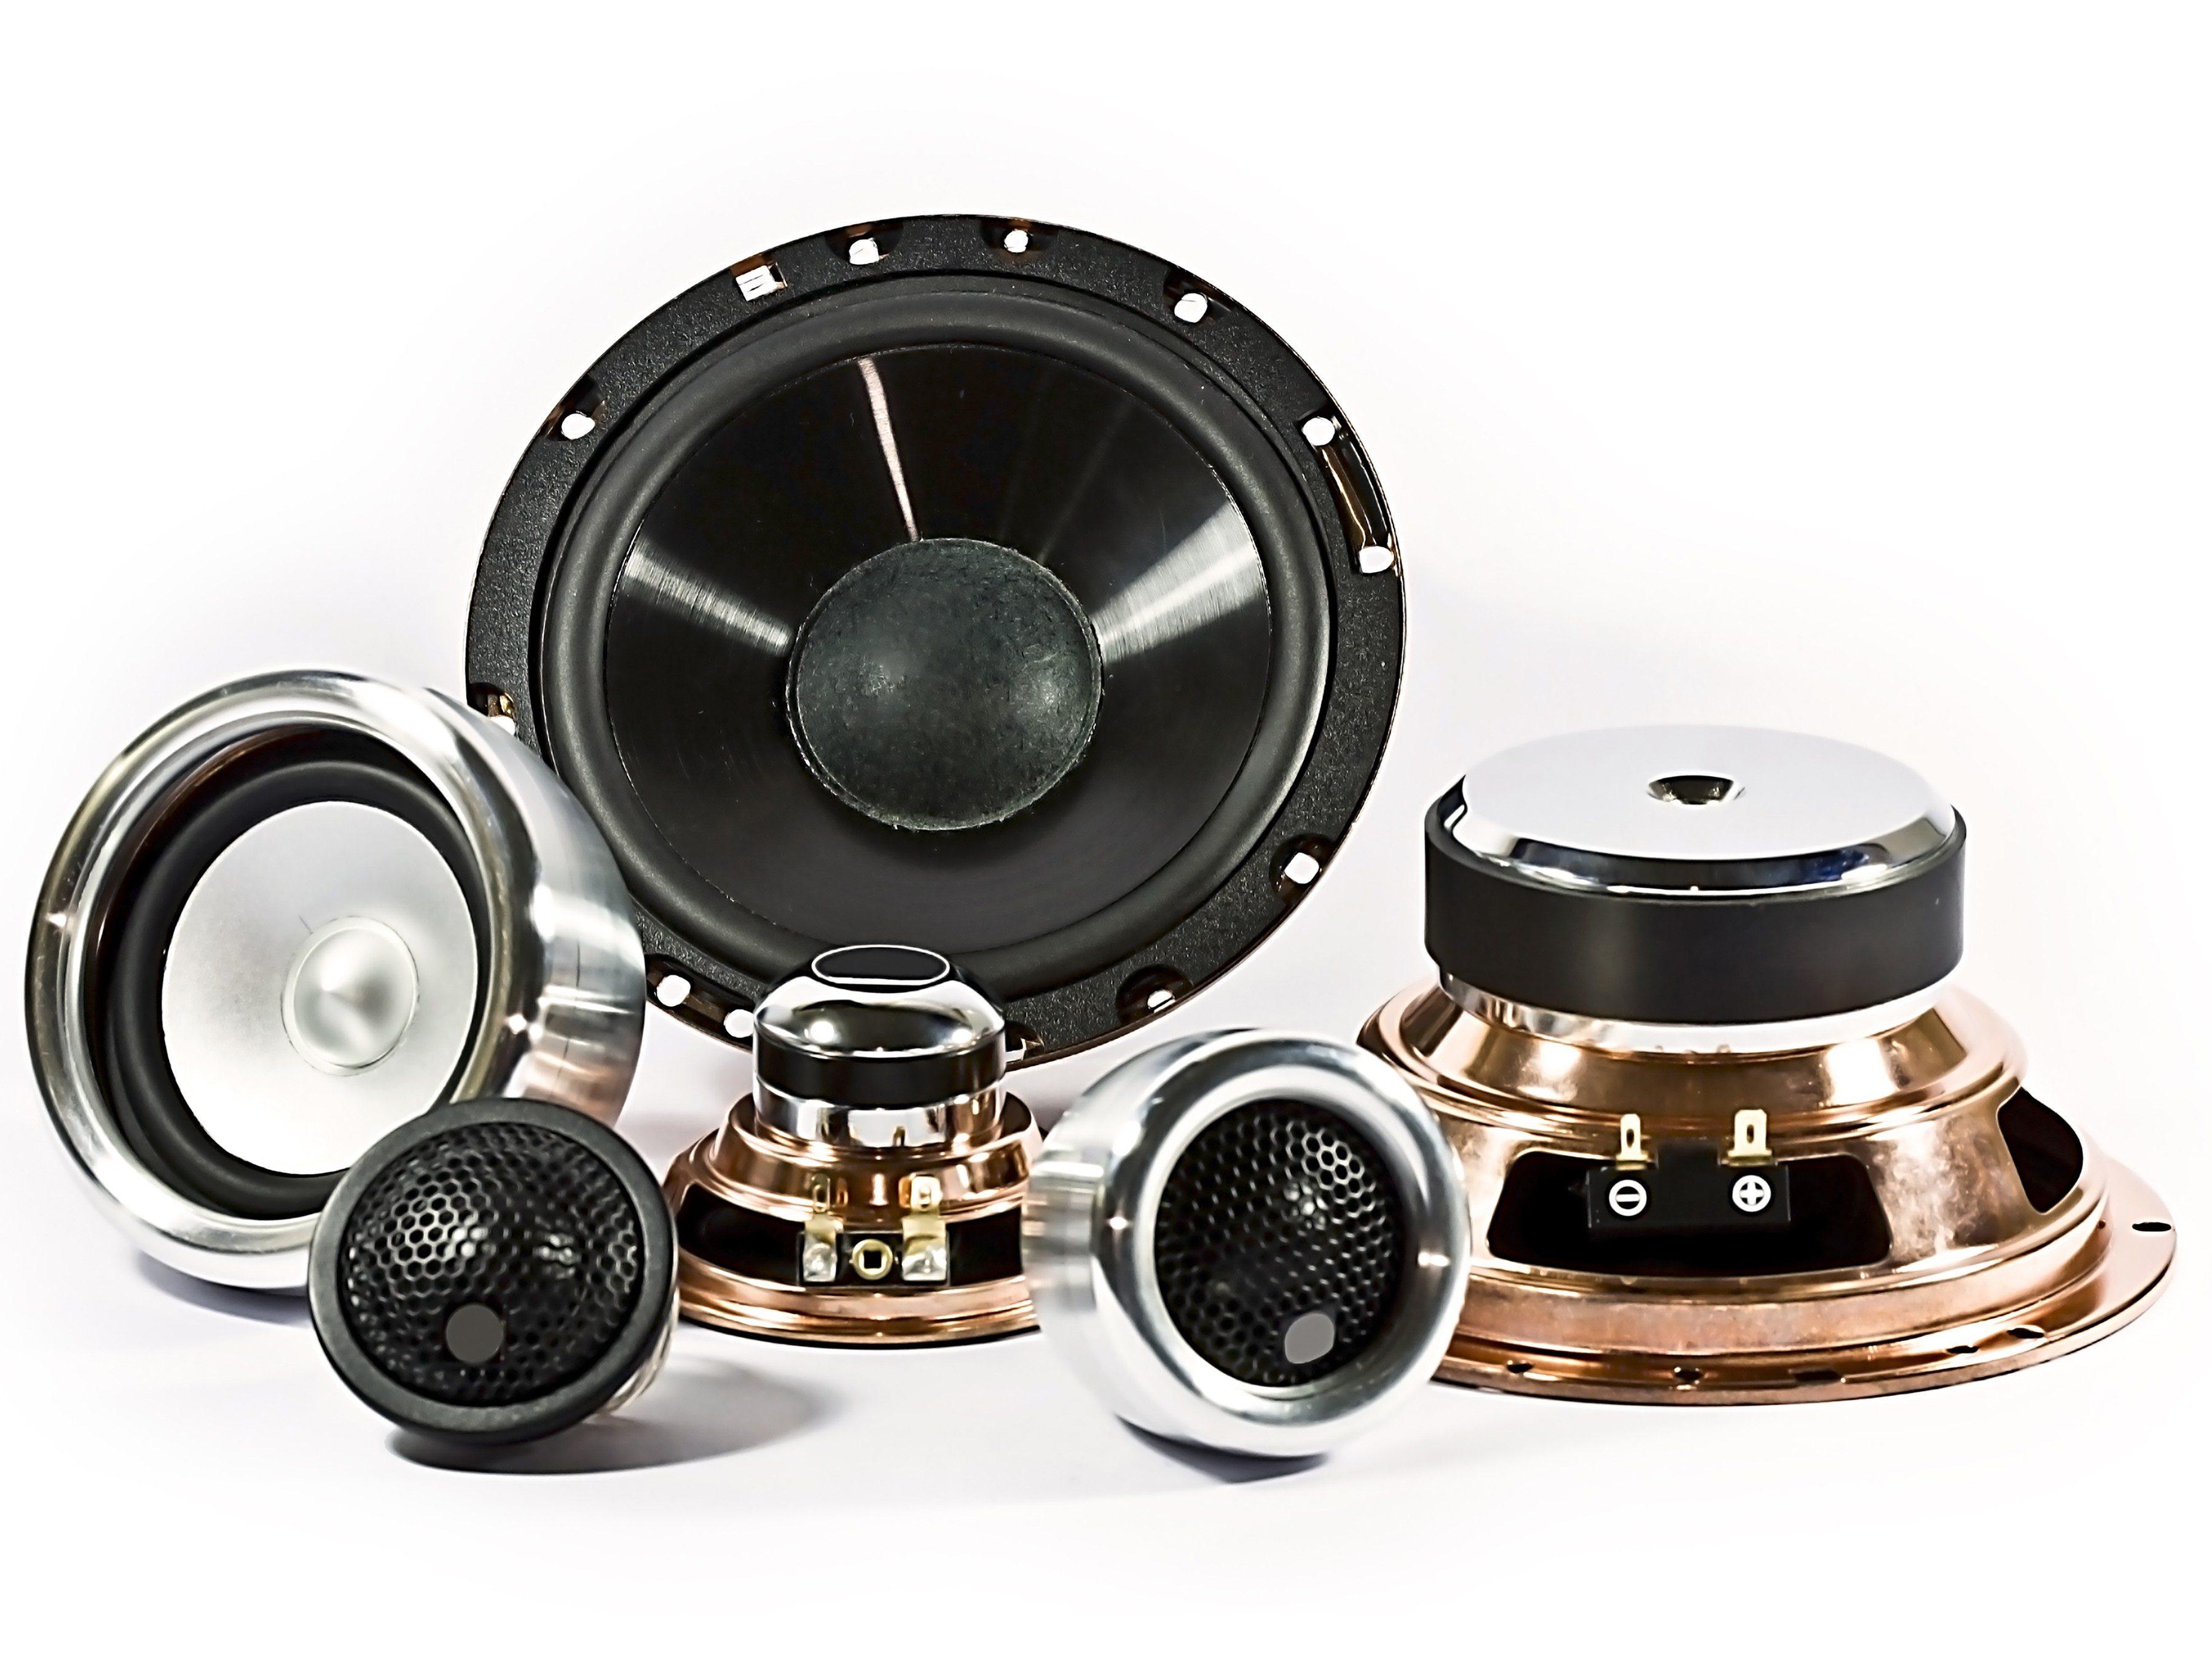 4. Upgraded Car Speakers